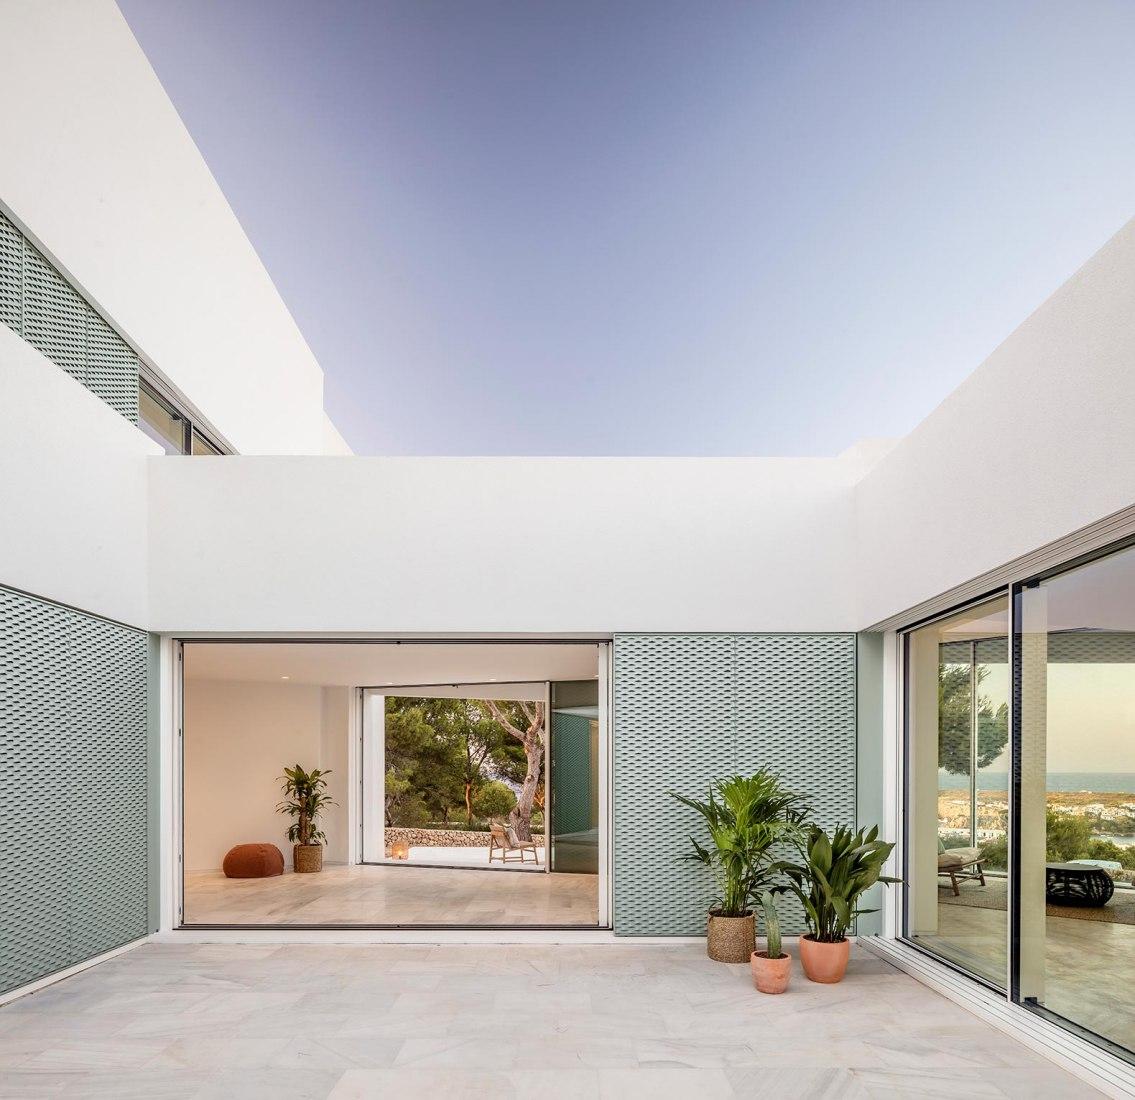 Casa patio por Nomo Studio. Fotografía por Adrià Goula